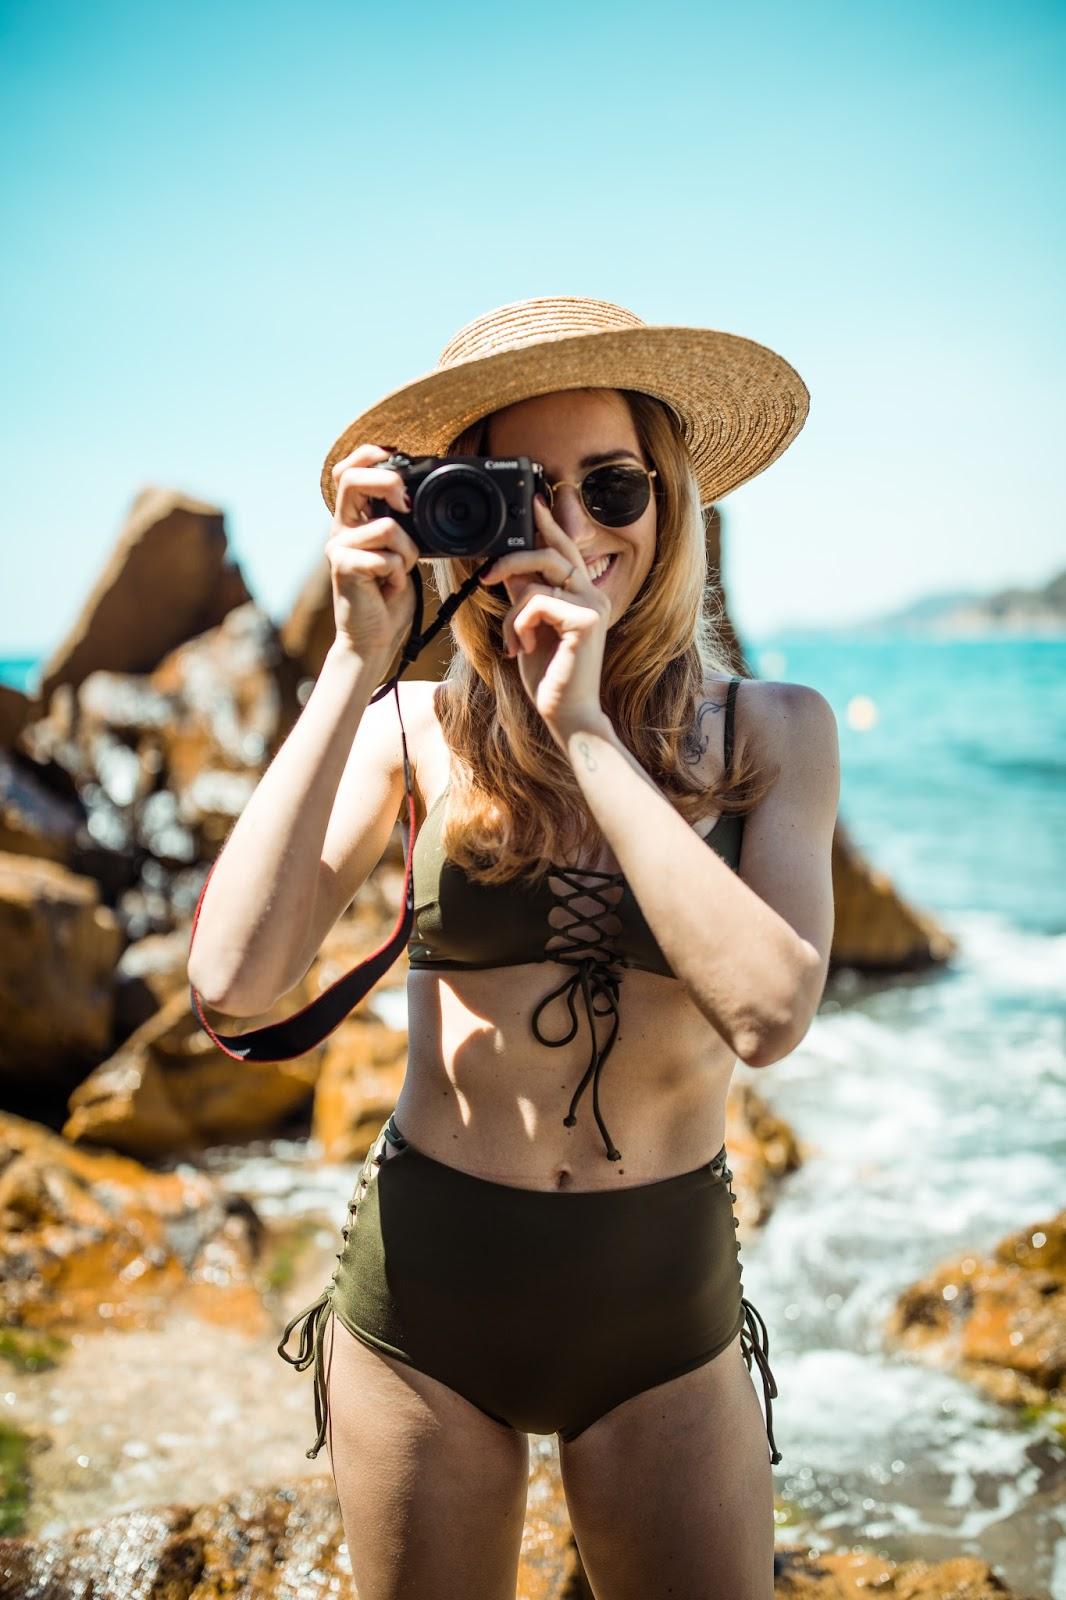 camera girl beach